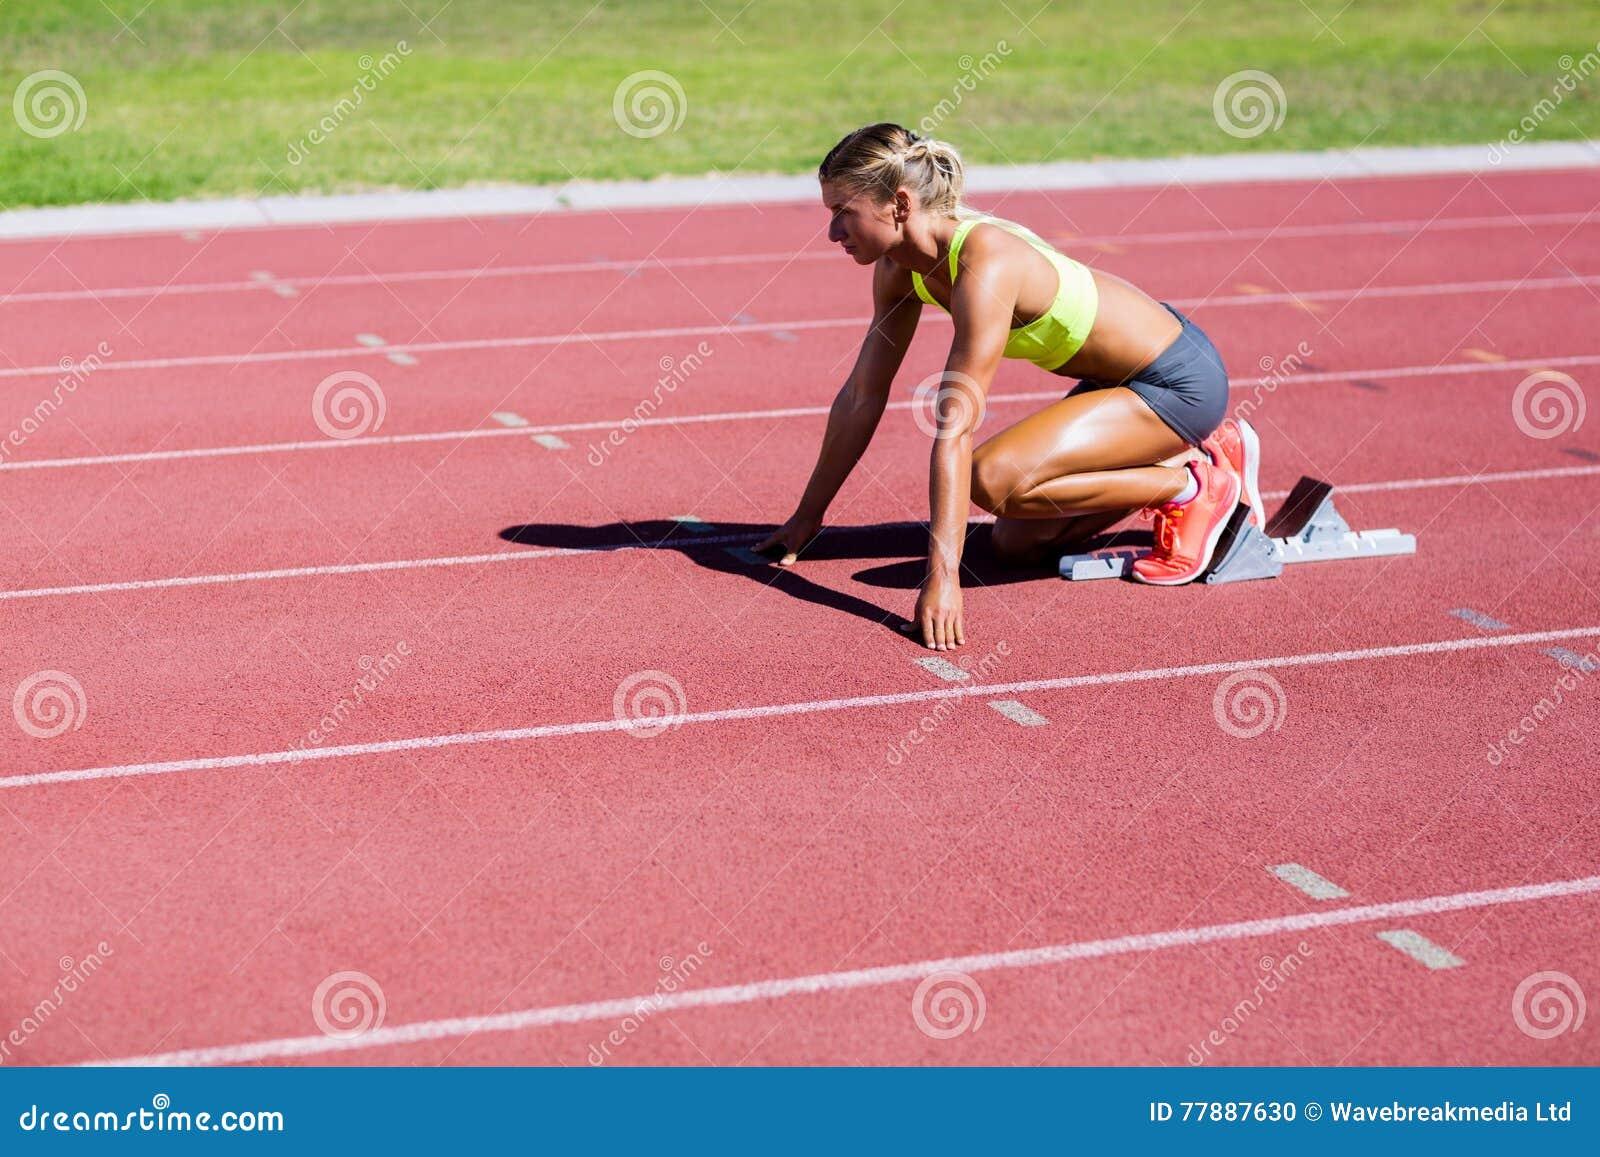 Atleta De Sexo Femenino Listo Para Correr En Pista Corriente Foto de archivo